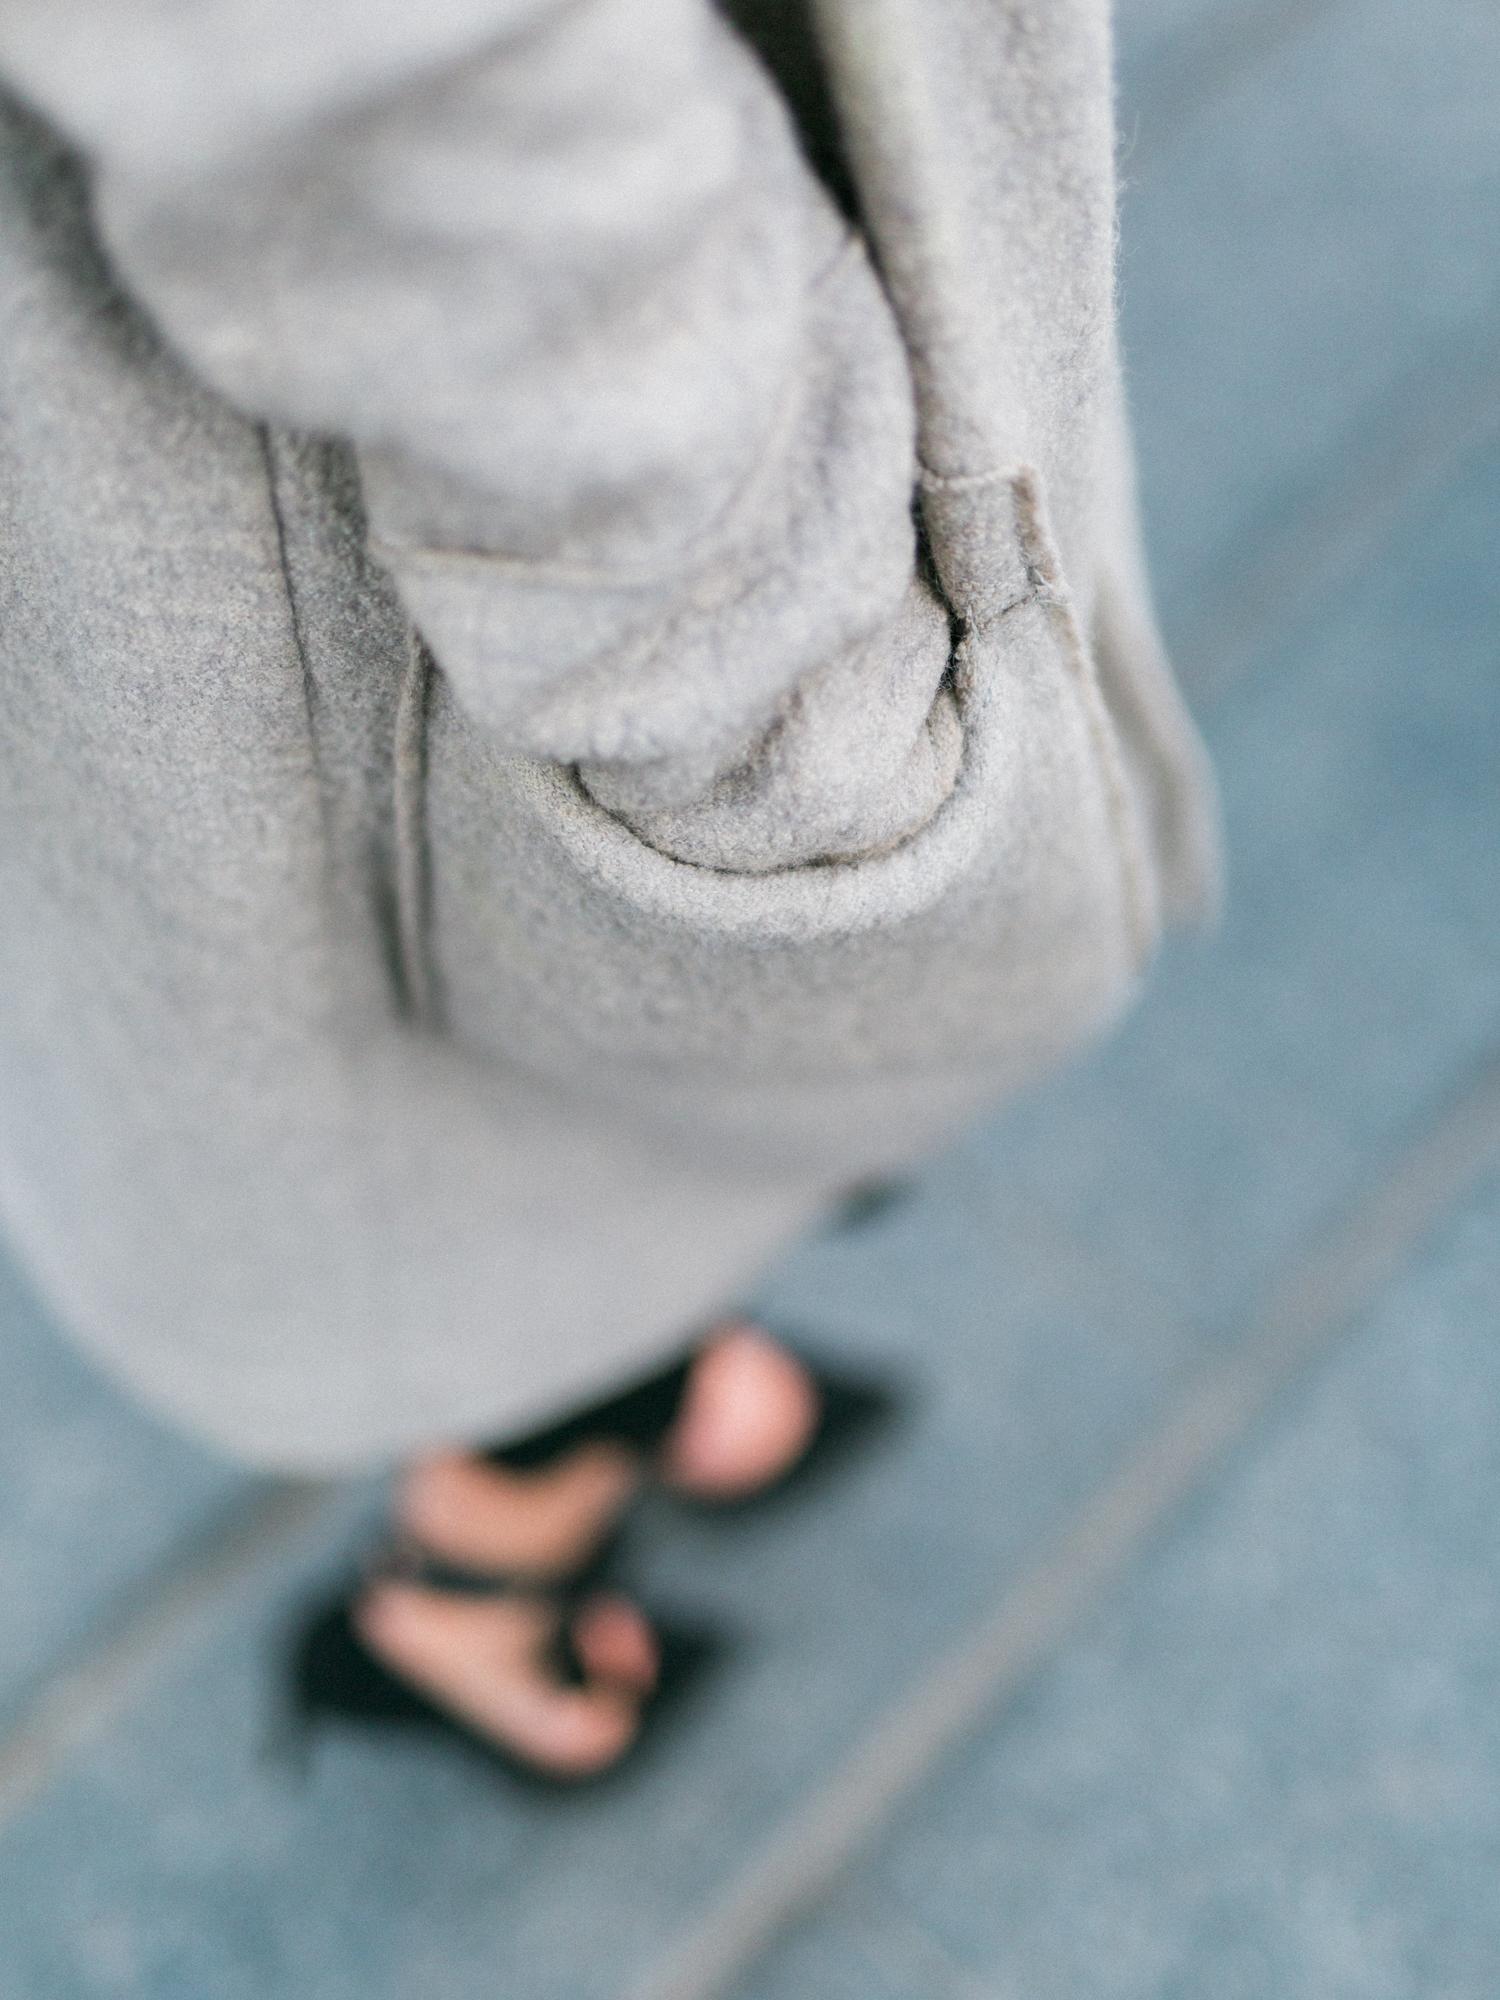 DanielleGirouxPhotography_Toronto_Portrait_StreetPhotography_0C6A1111.jpg